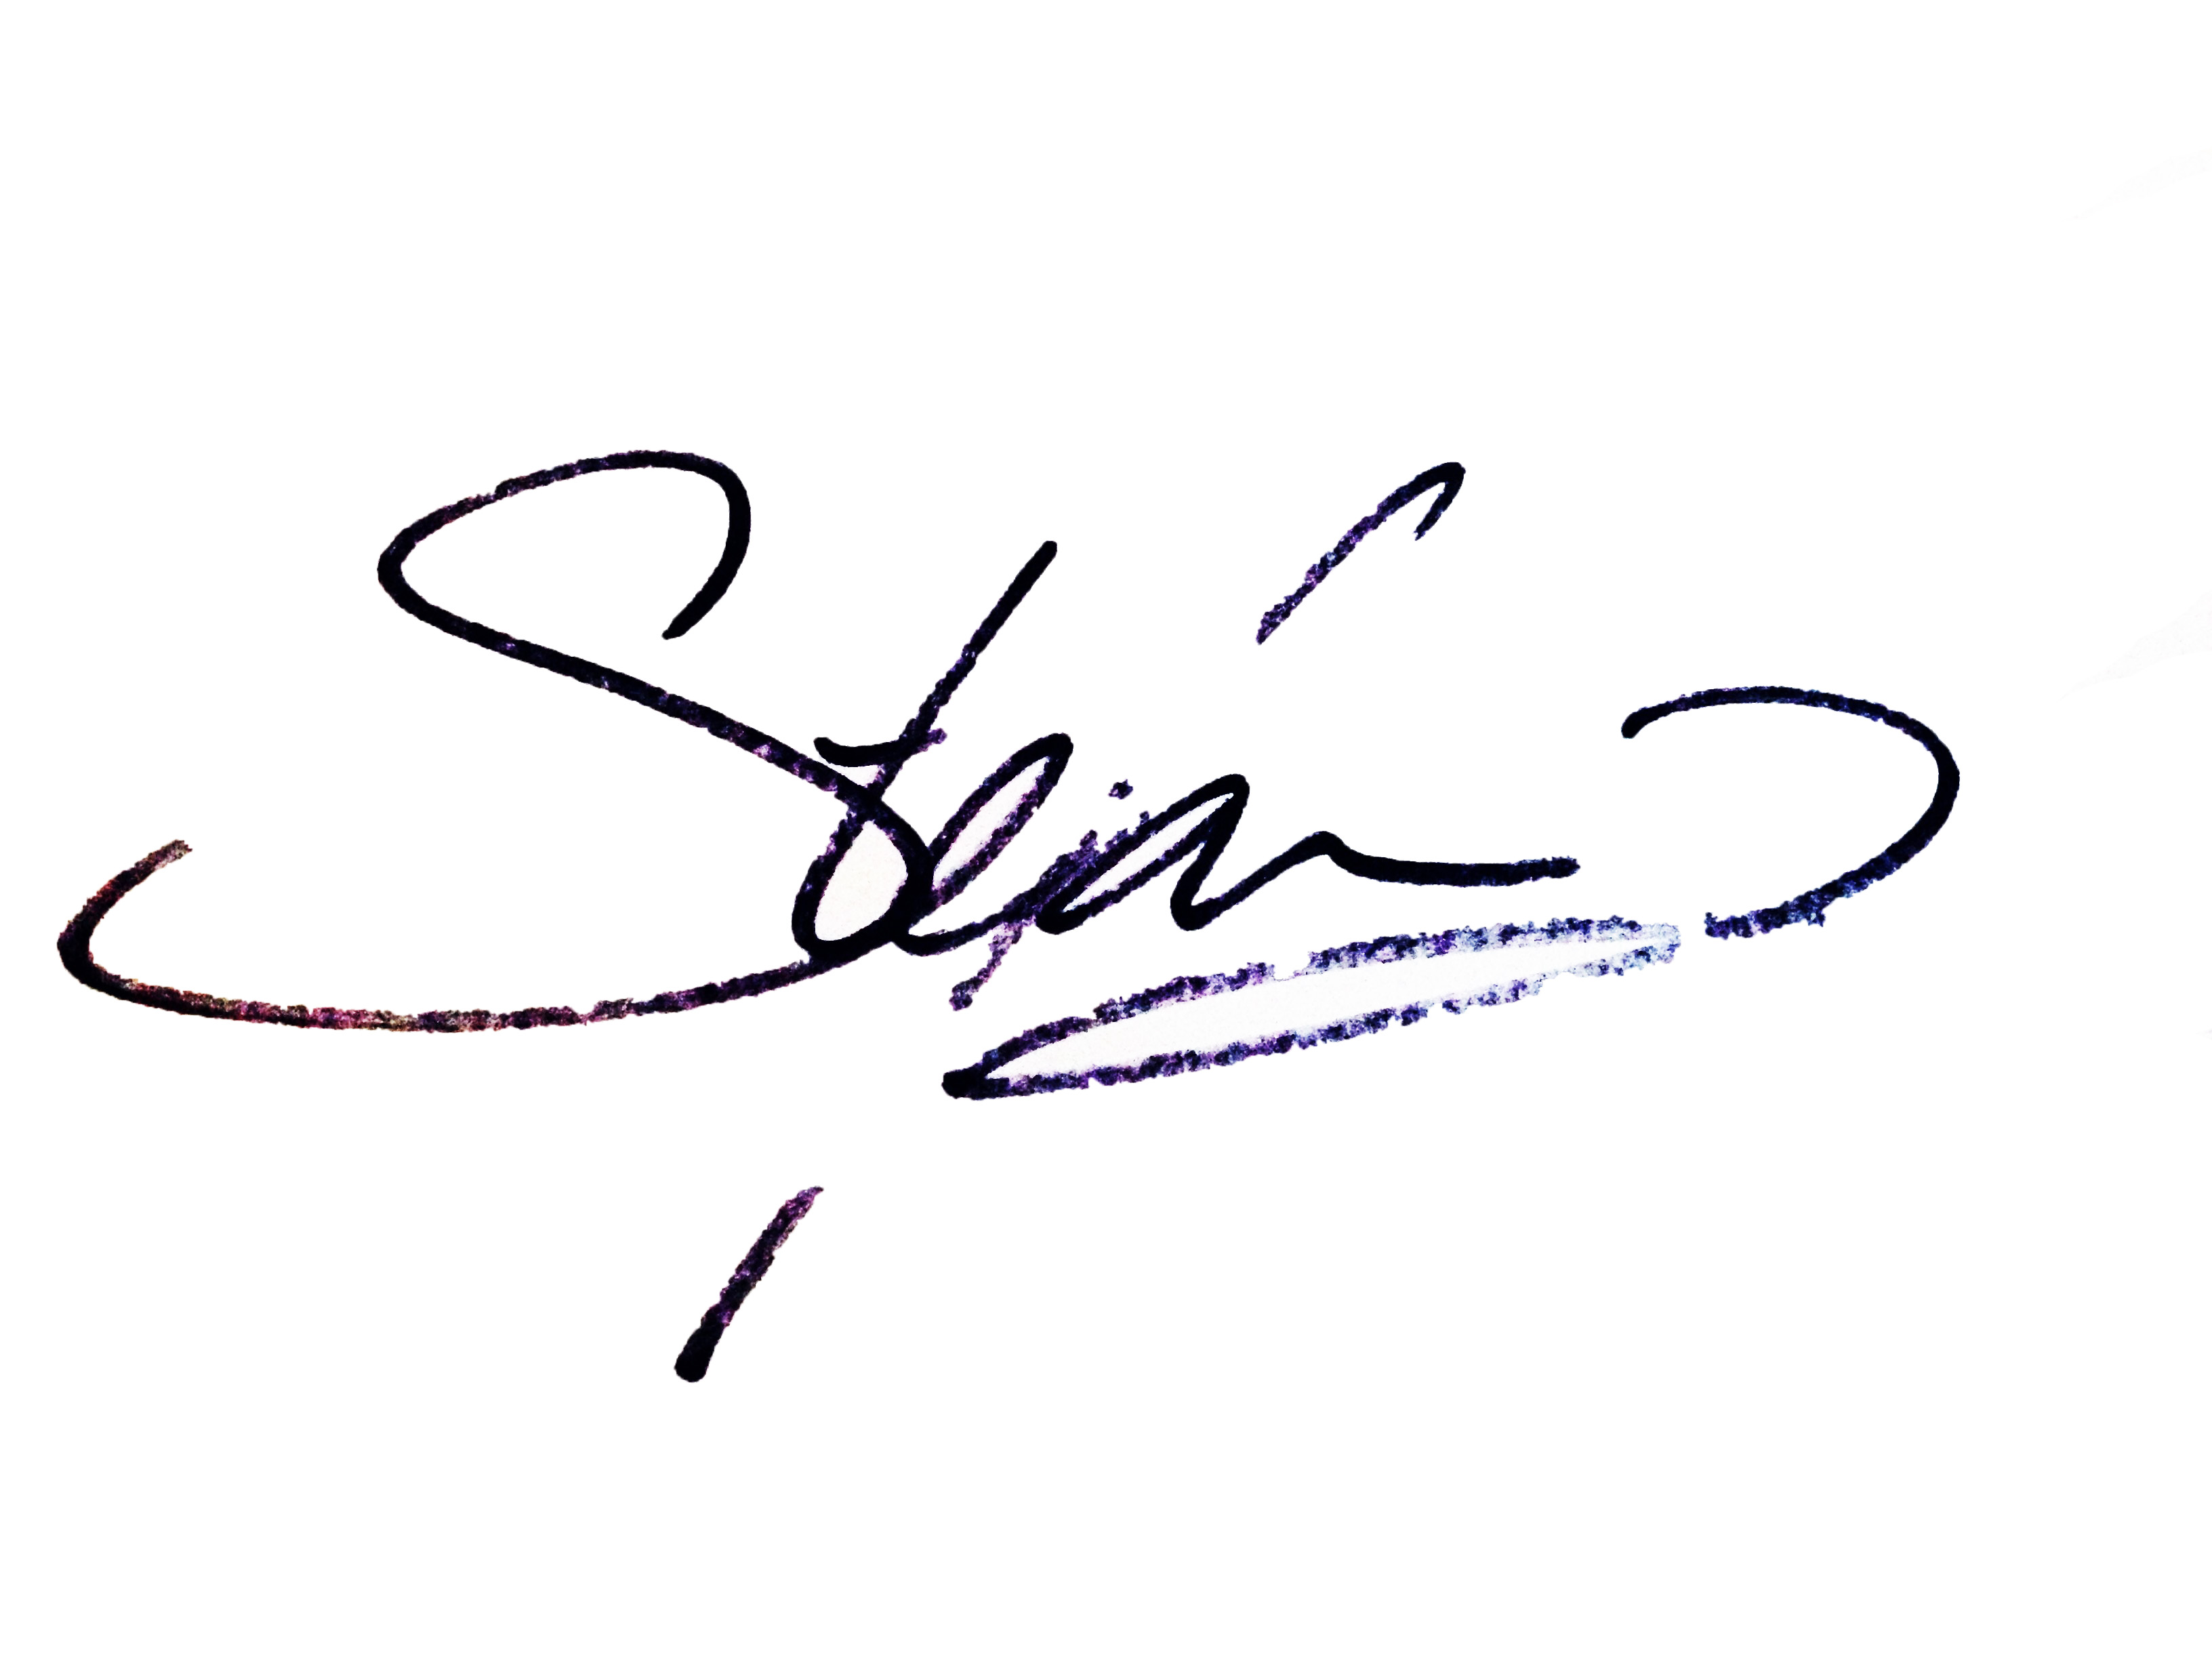 Stefani Jankulovski's Signature